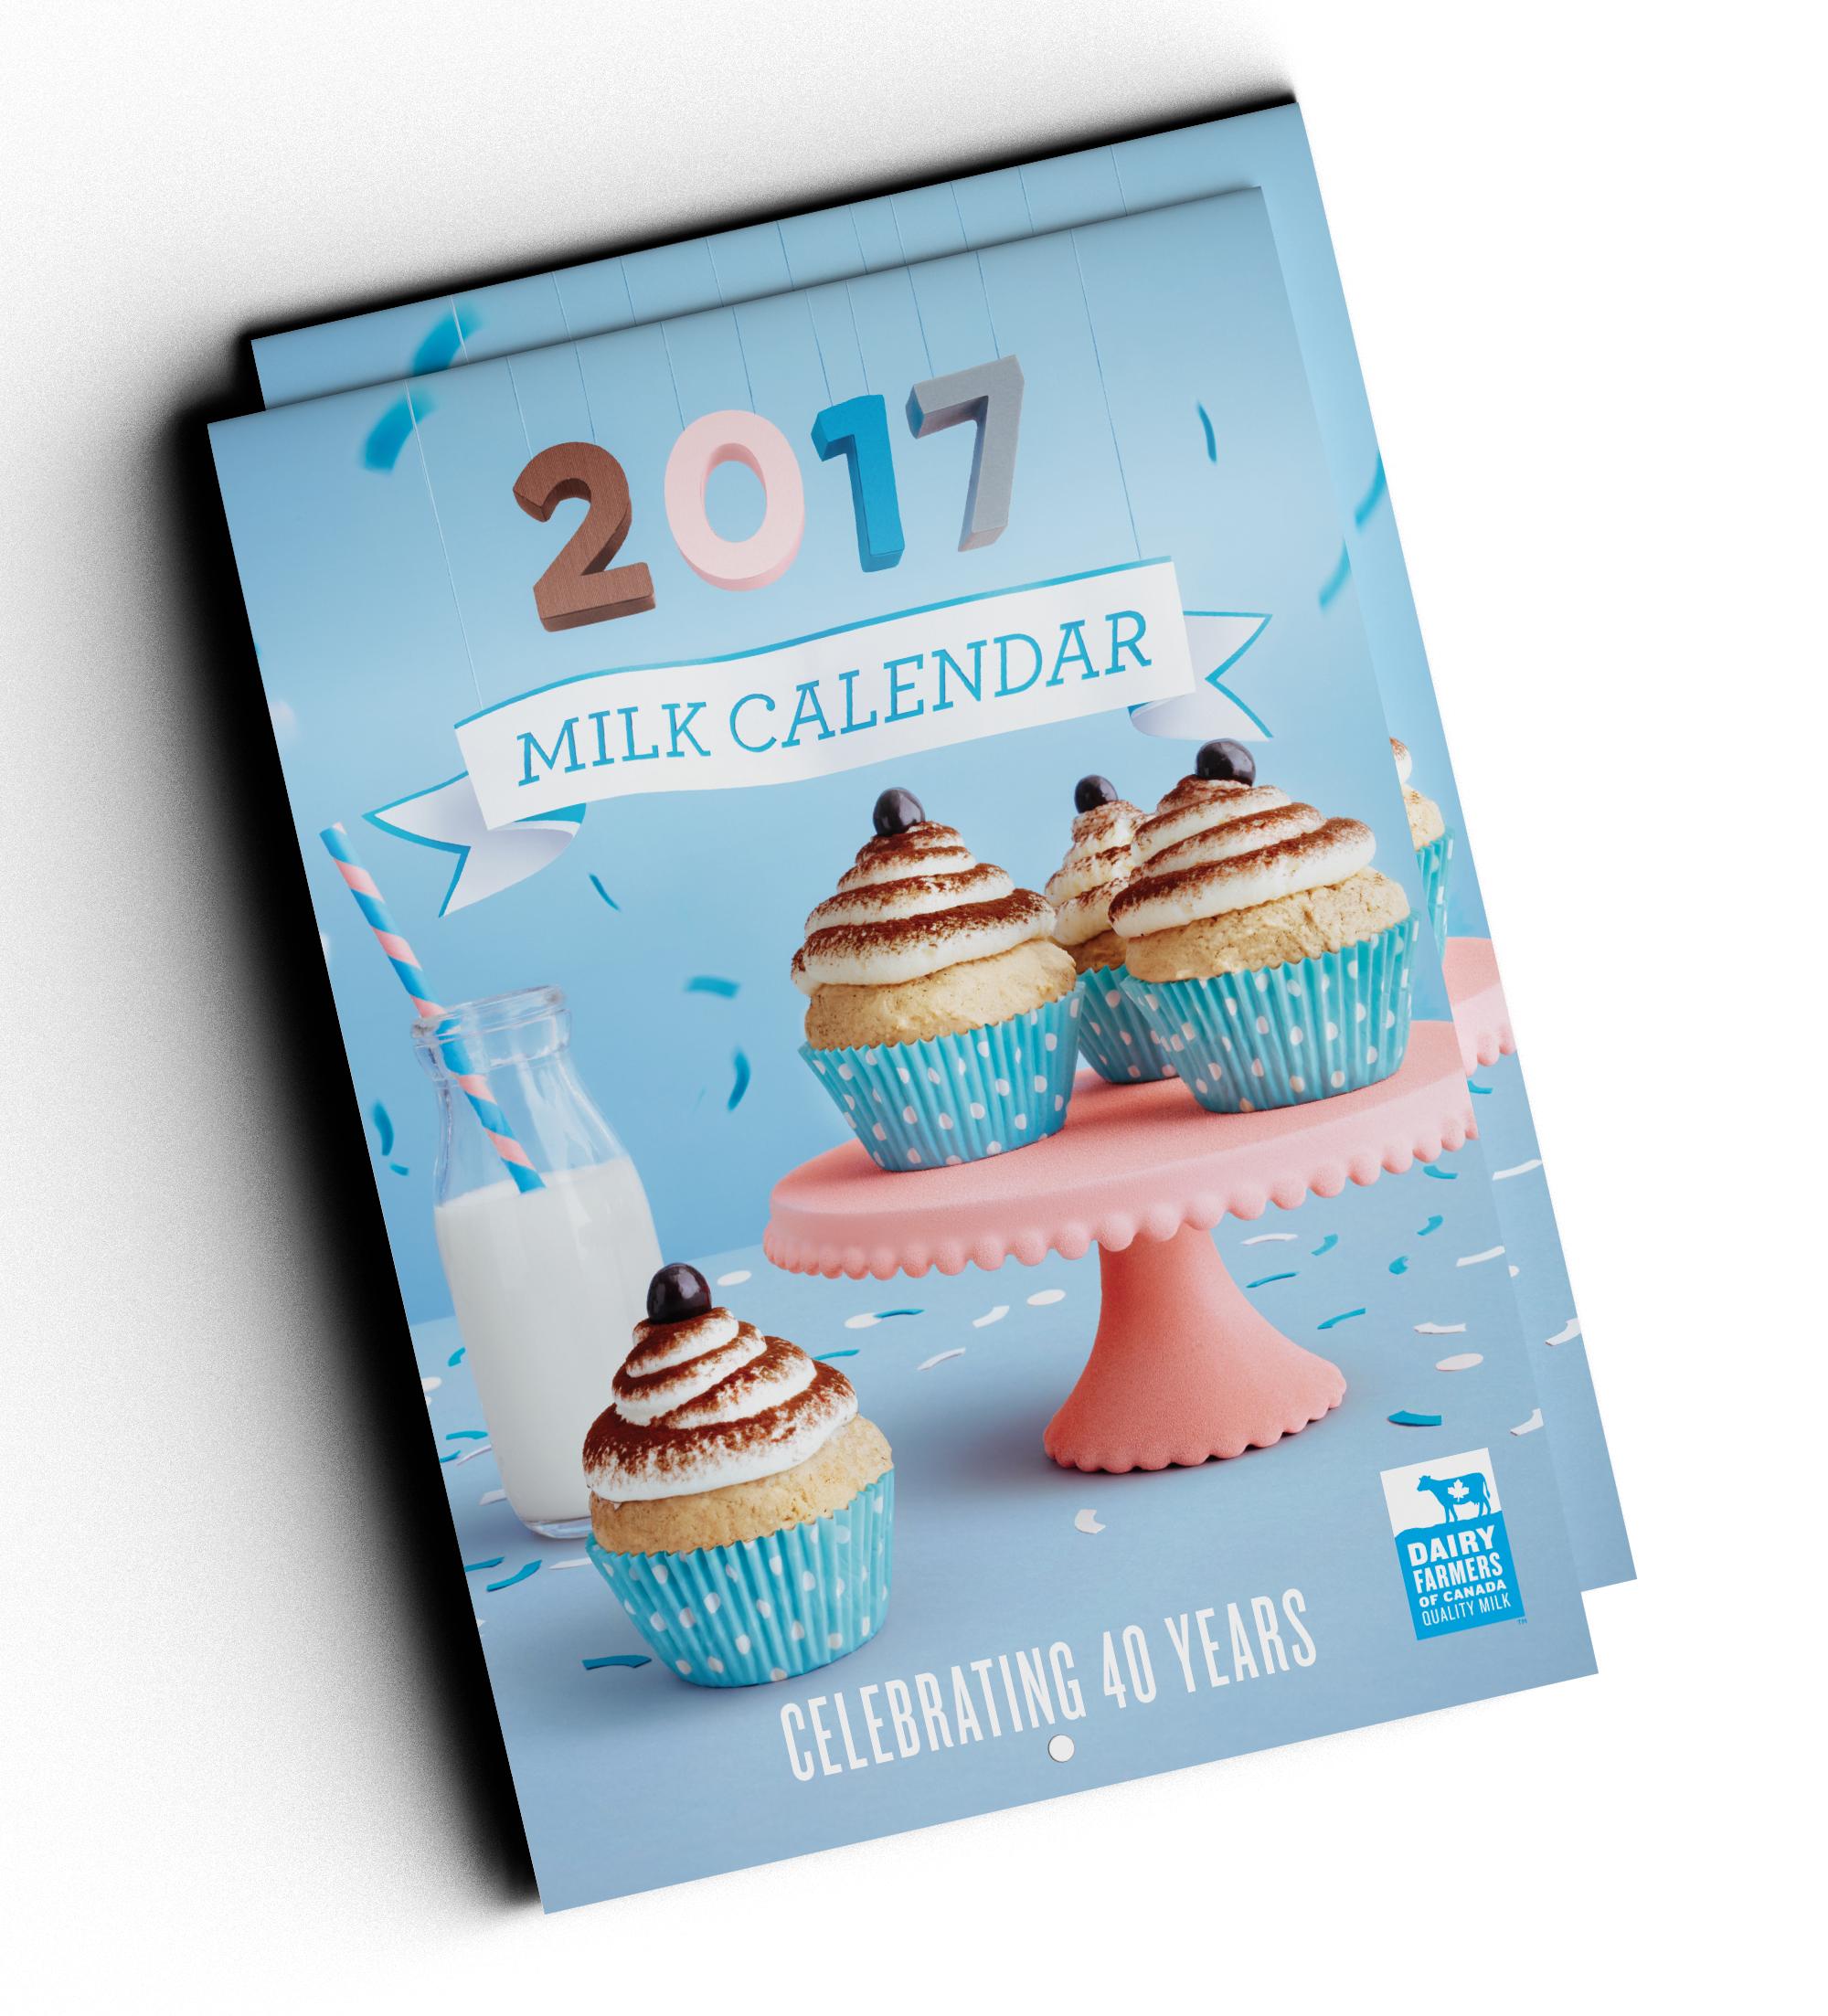 DFC_Milk_Calendar_2017_cover